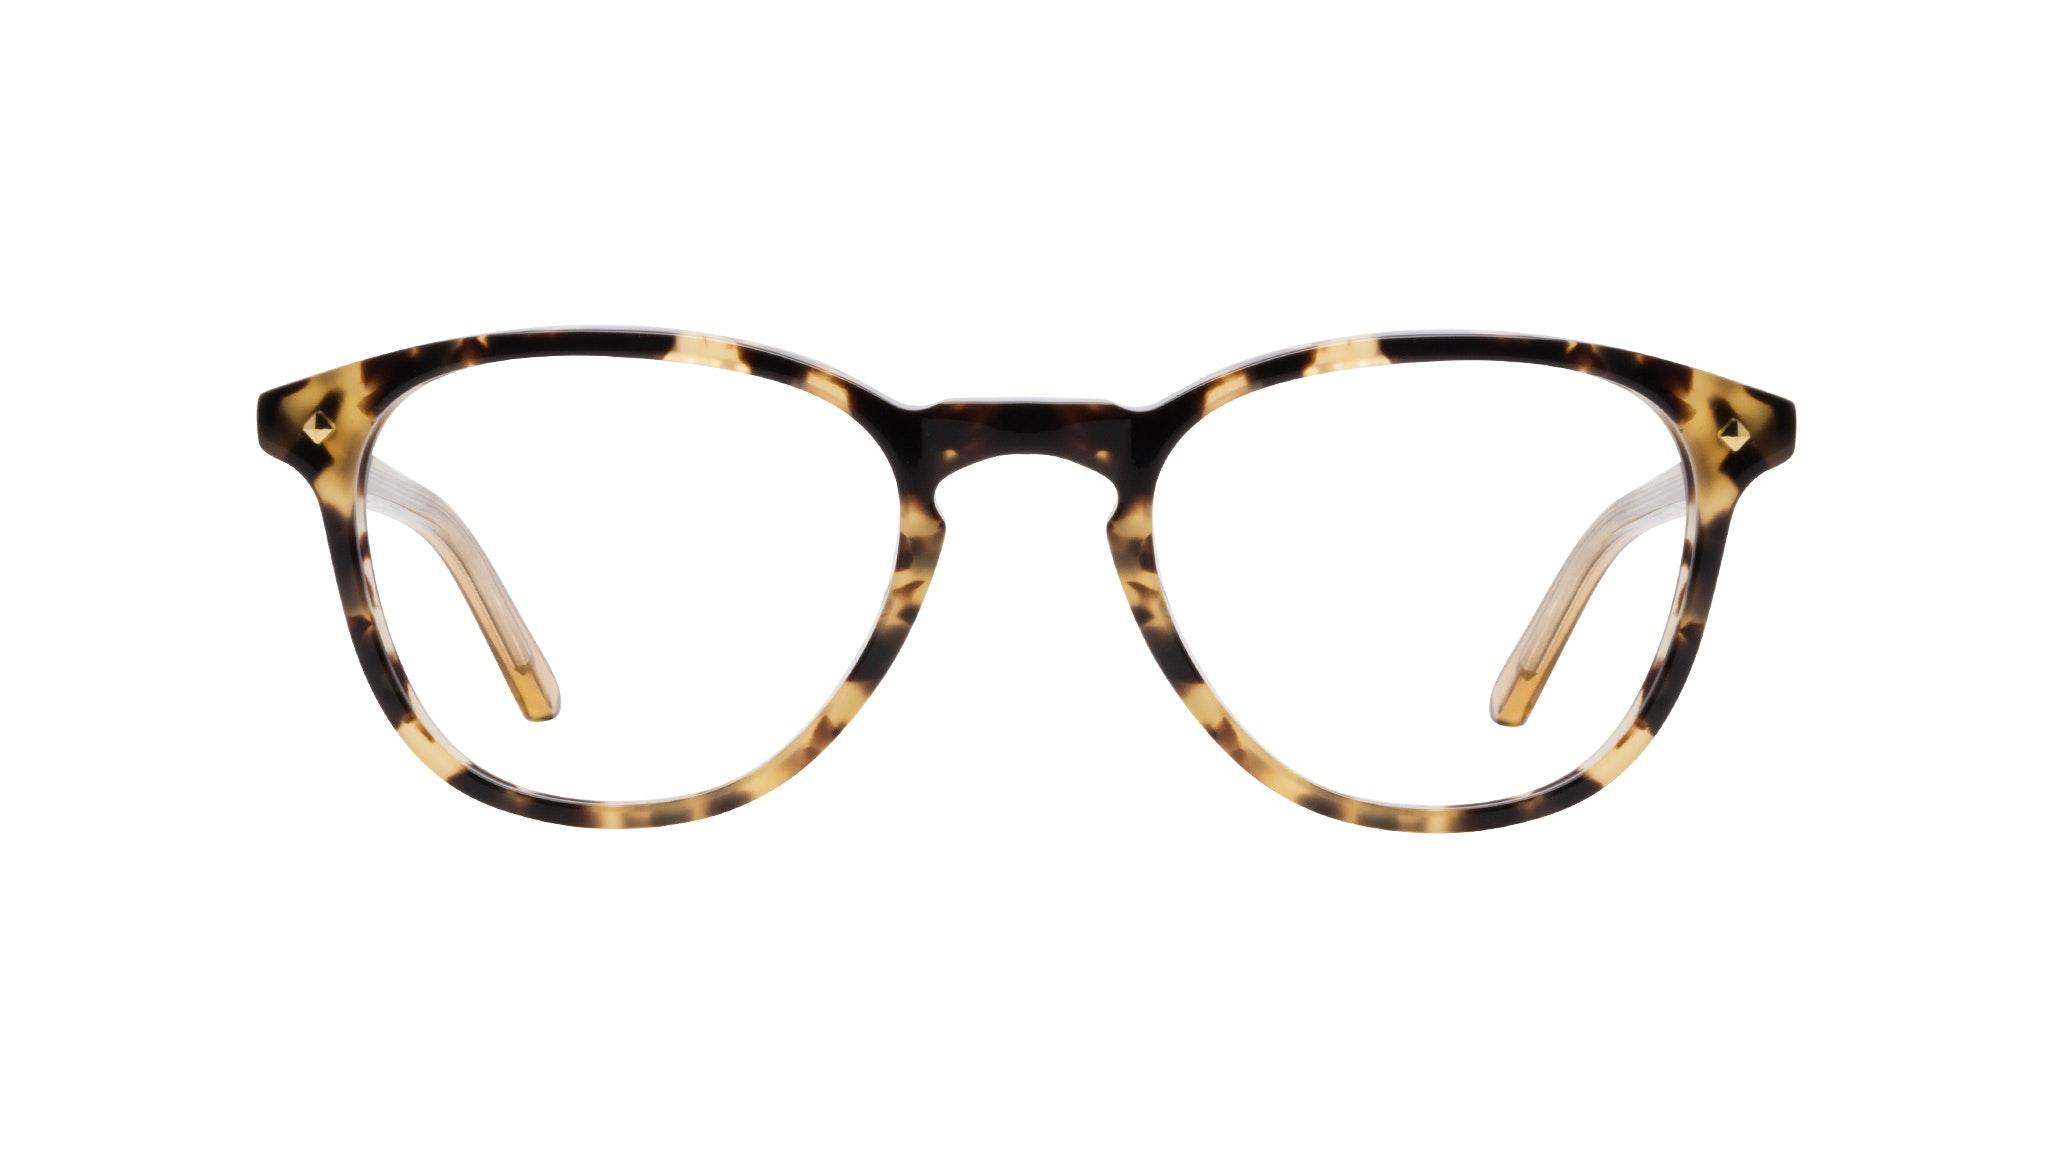 Affordable Fashion Glasses Round Eyeglasses Women Crush Bingal Front